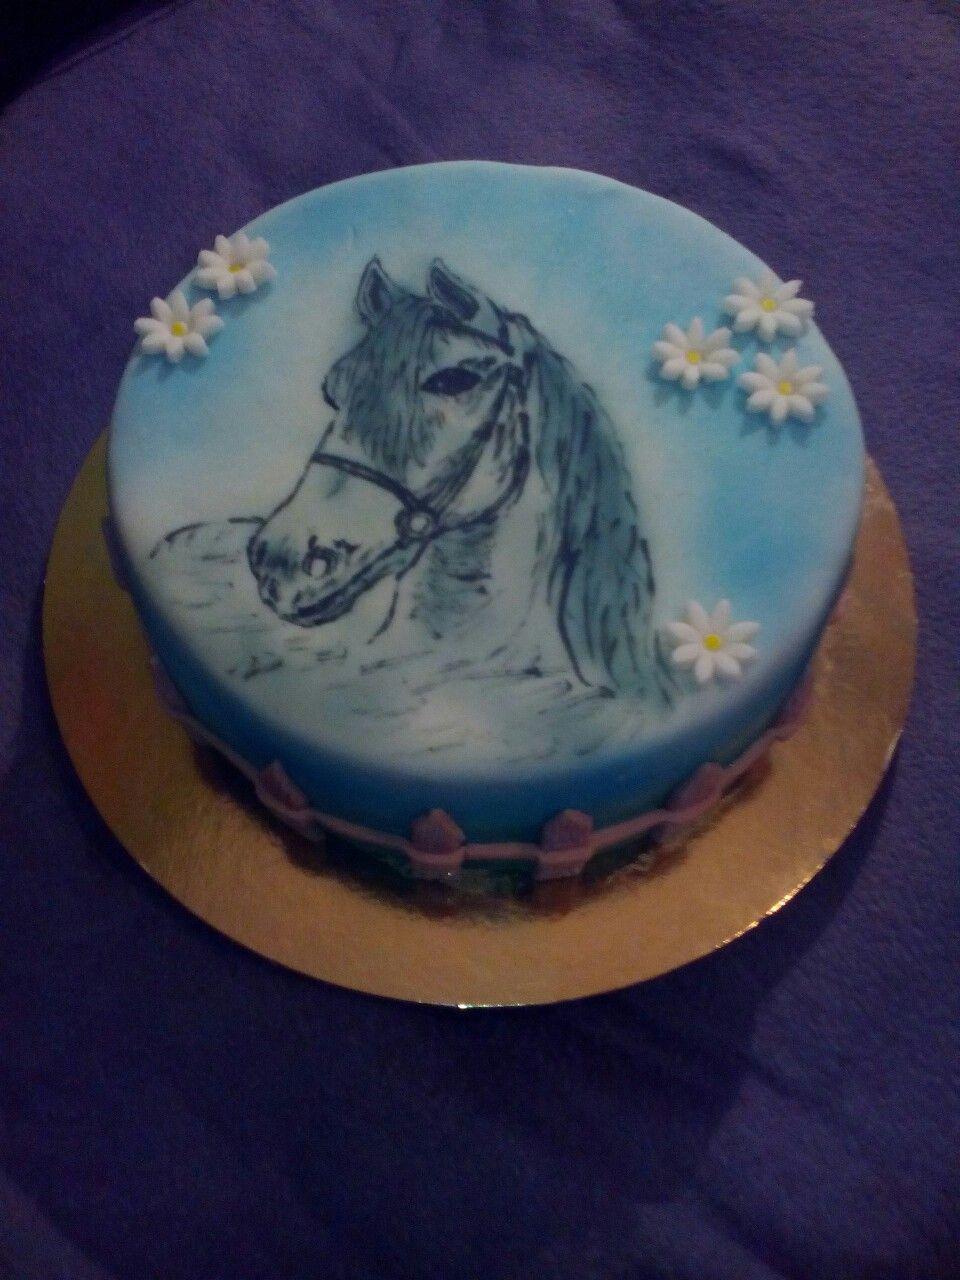 lovas torta képek Lovas torta | Tortáim | Pinterest lovas torta képek